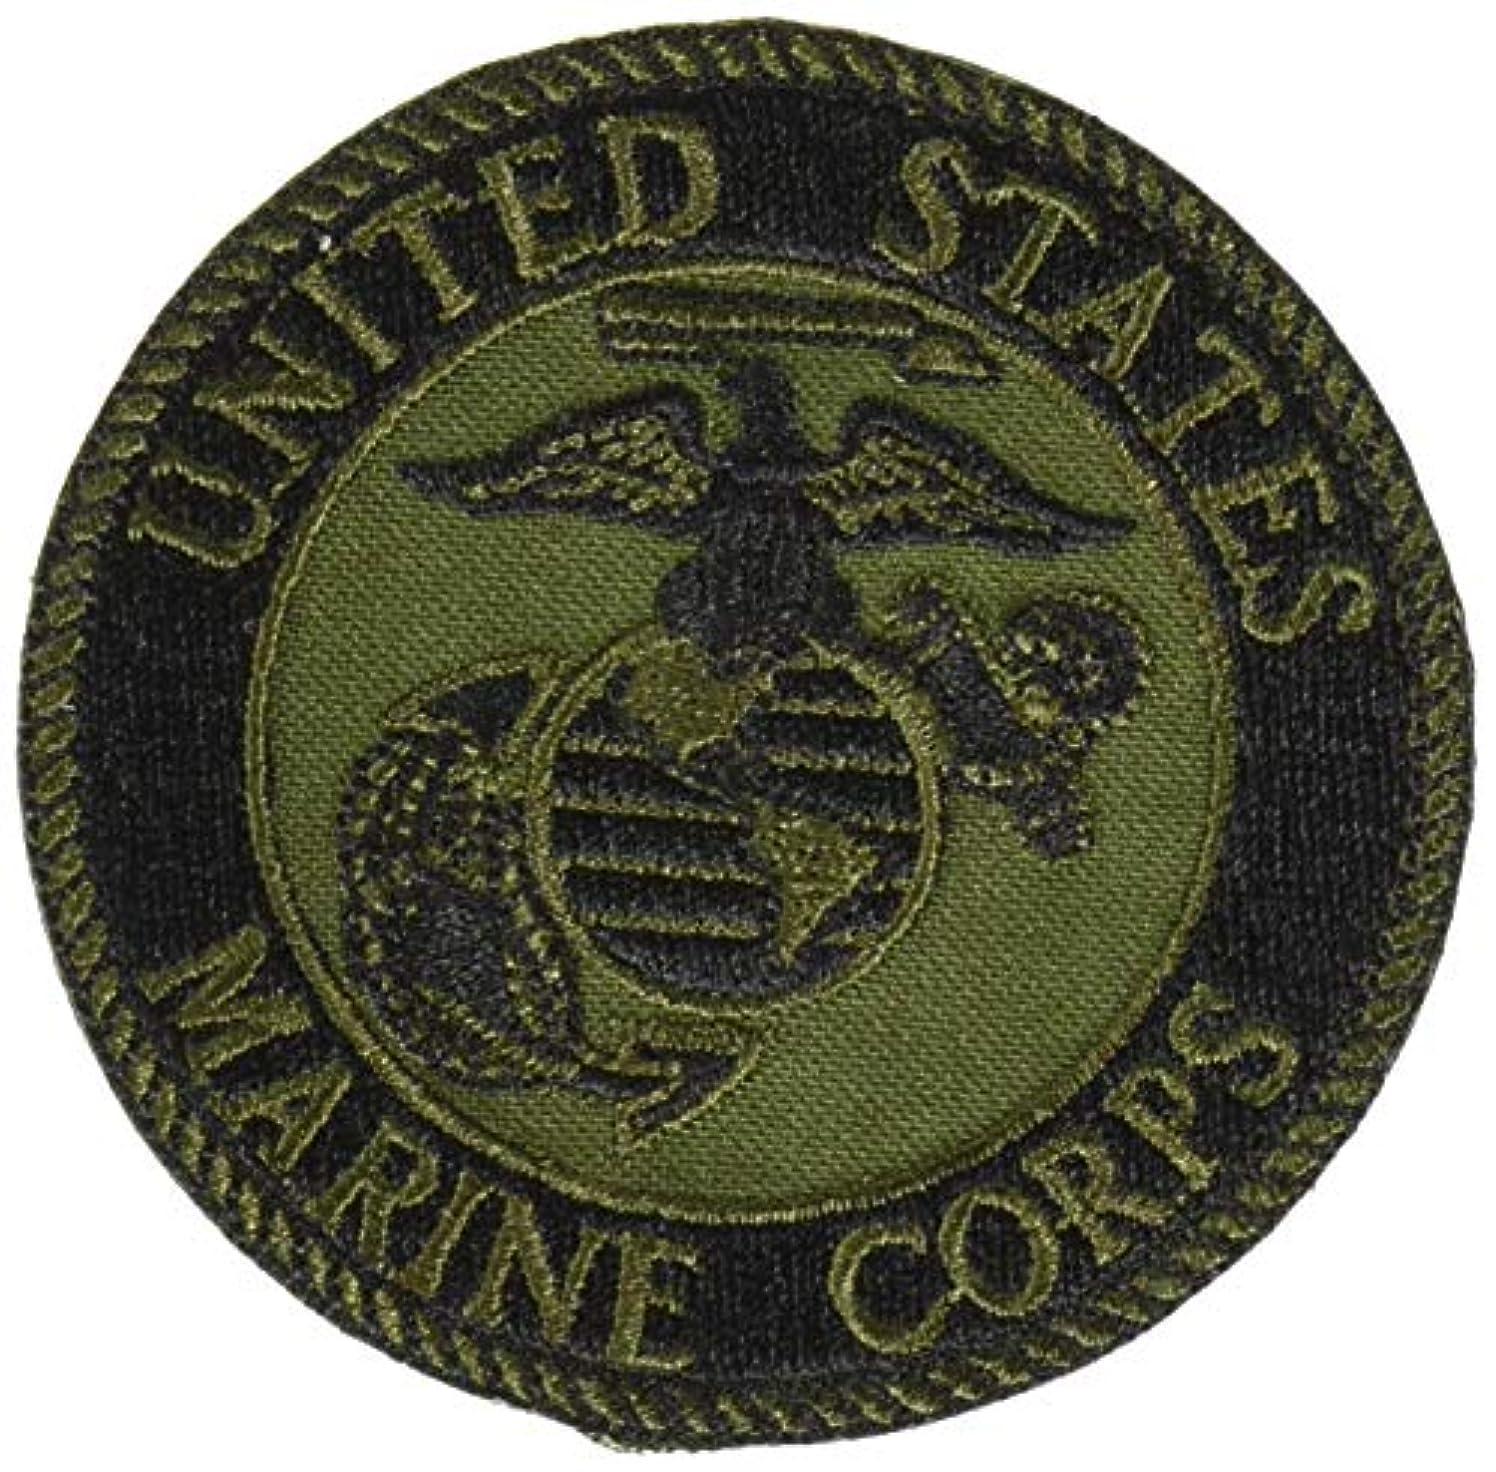 EagleEmblems PM0894 Patch-USMC Logo (03S) (Subdued) (3'')